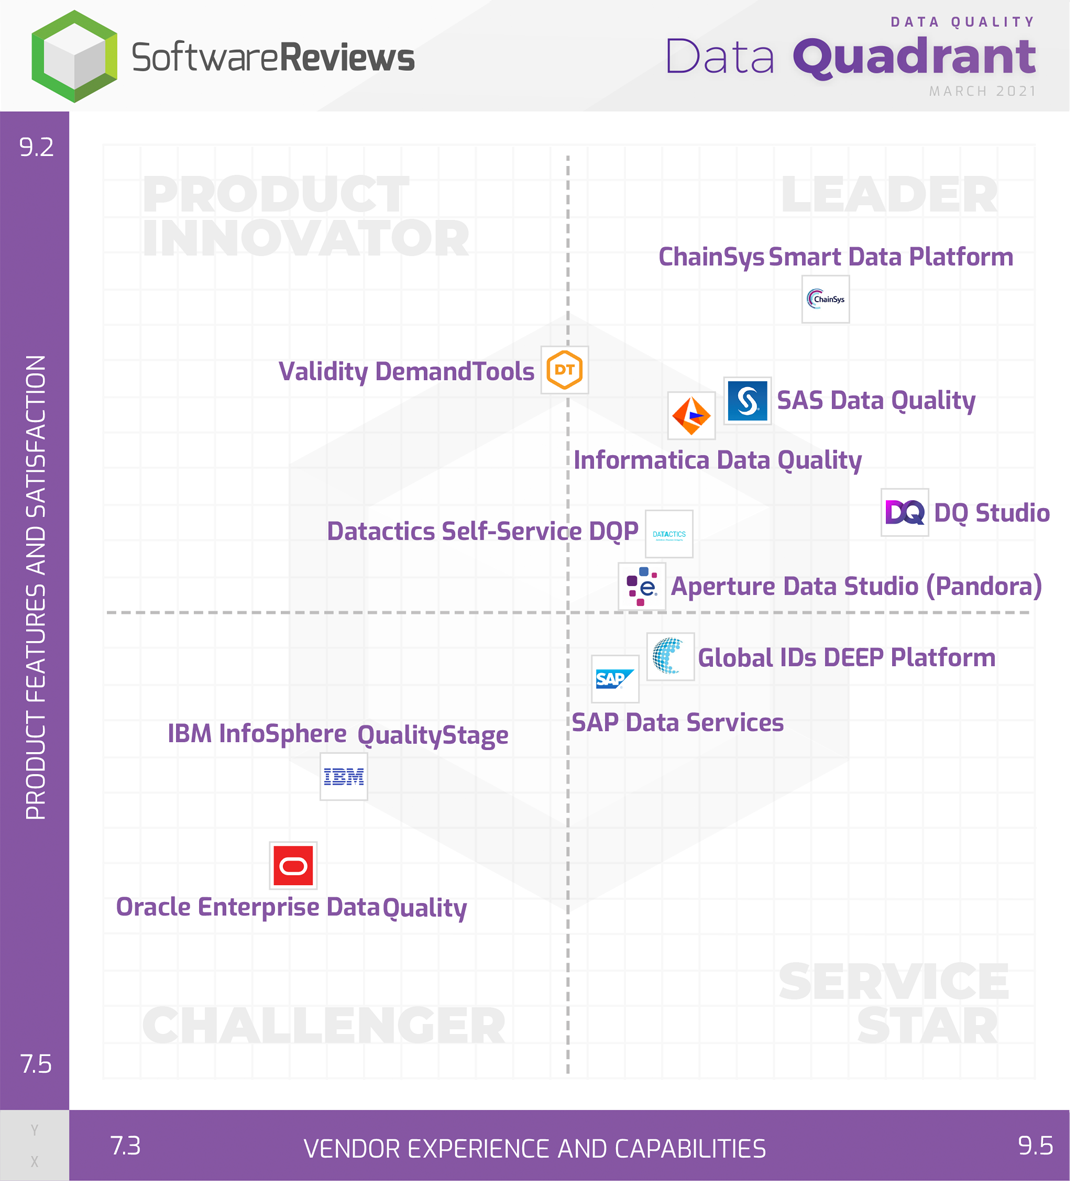 Data Quality Data Quadrant